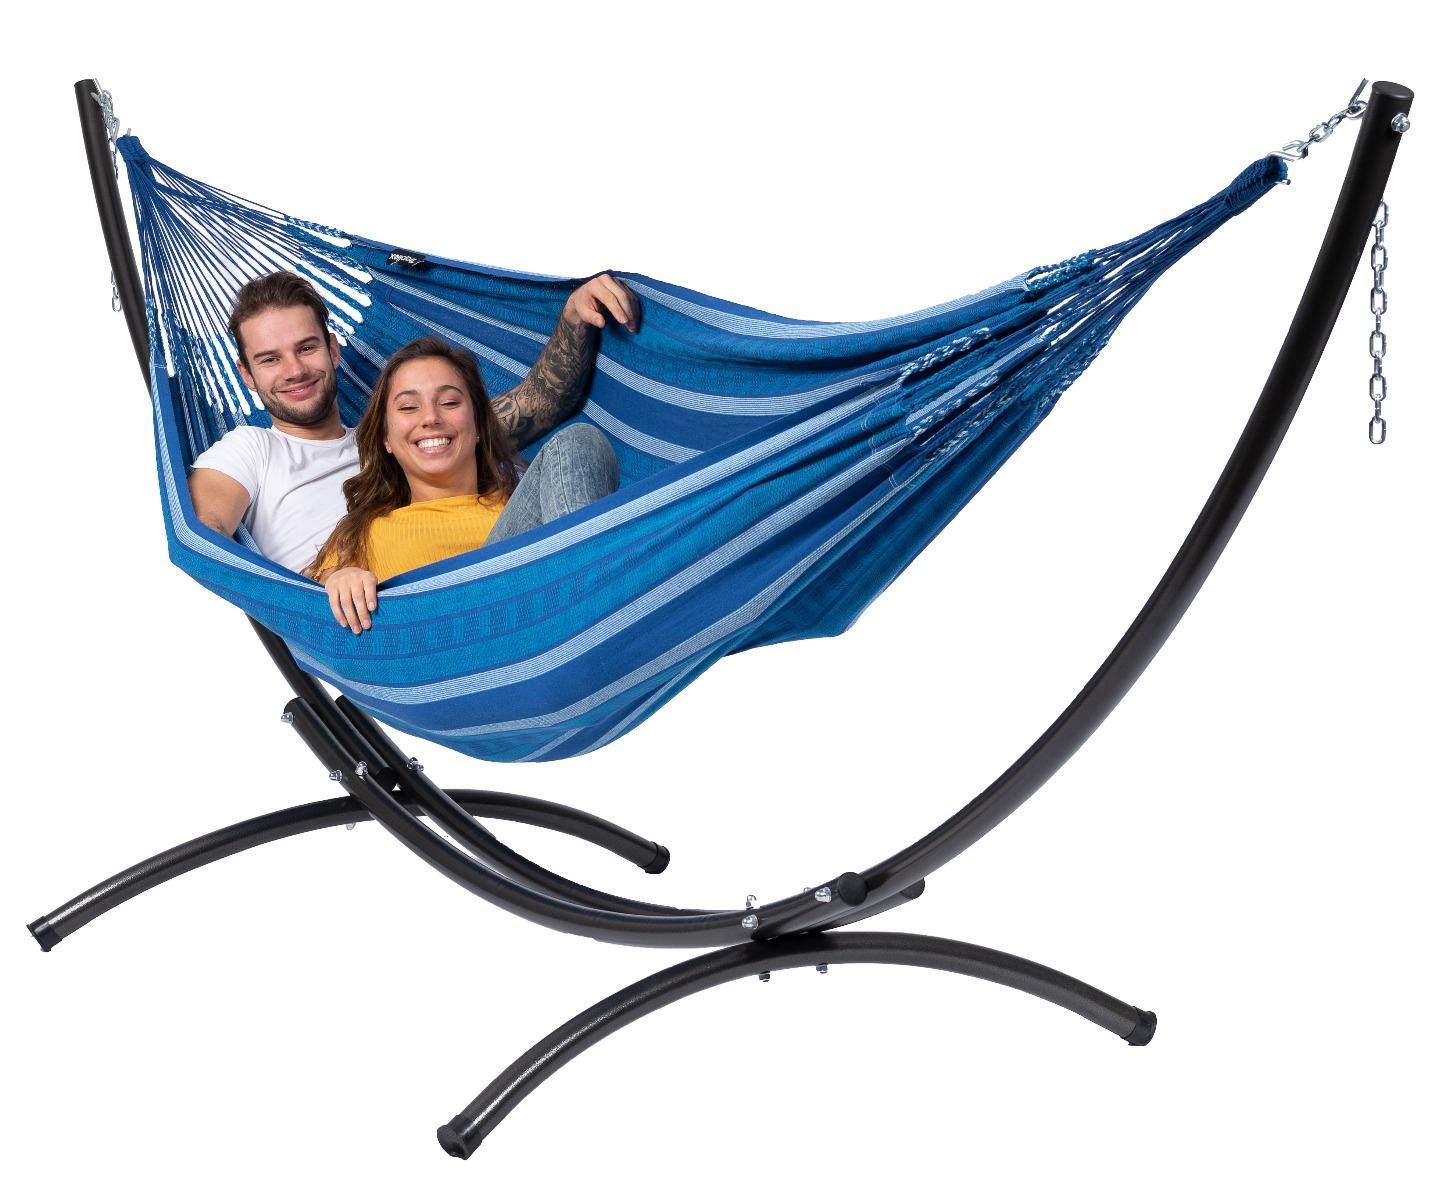 'Arc & Chill' Calm Tweepersoons Hangmatset - Blauw - Tropilex �